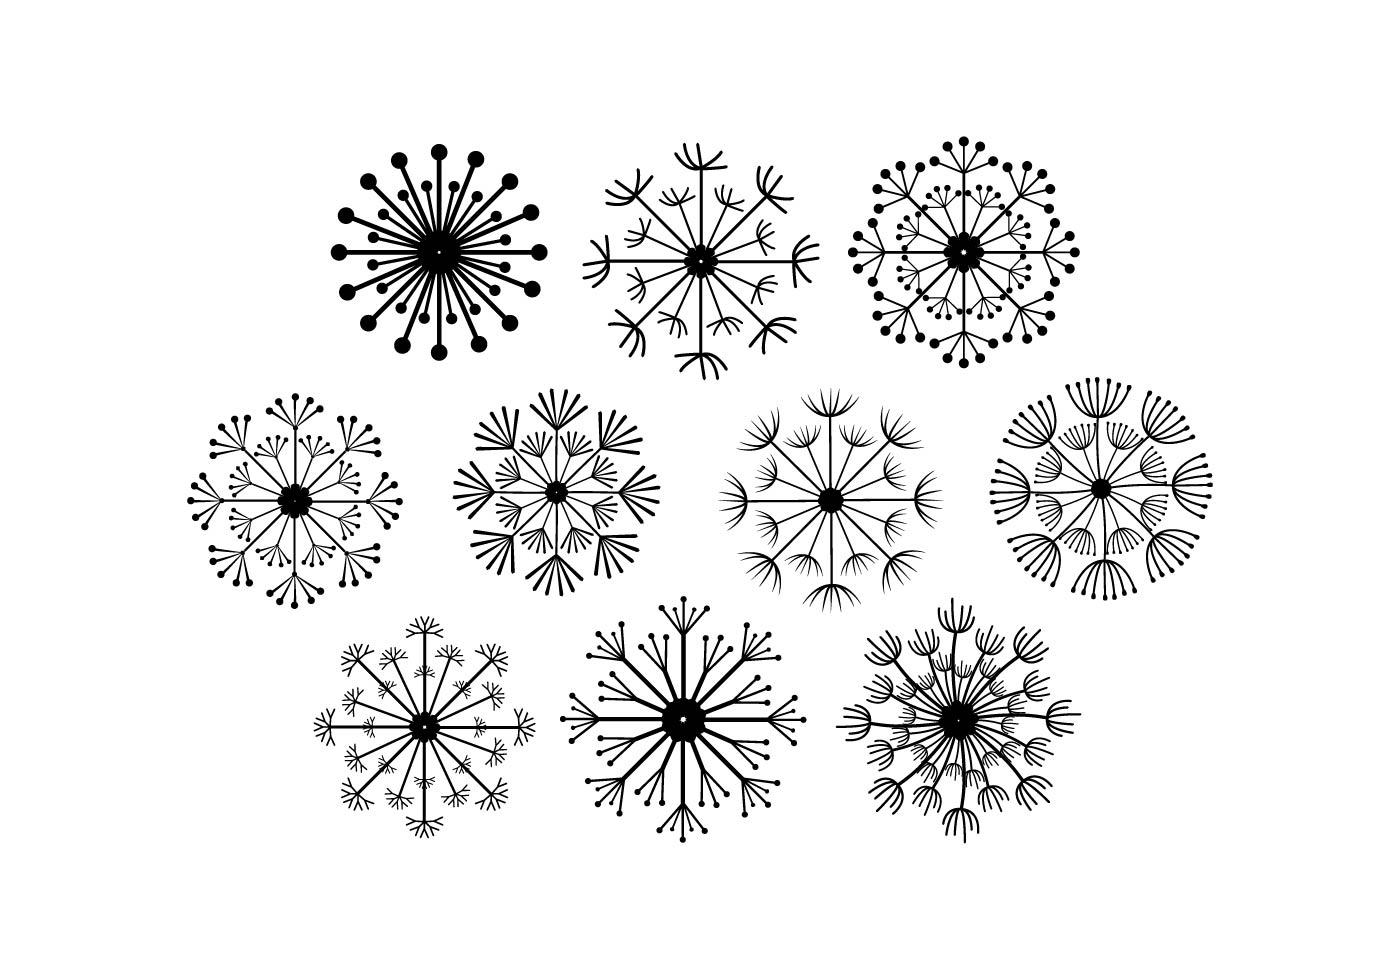 kostenlose blowball vector kostenlose vektor kunst. Black Bedroom Furniture Sets. Home Design Ideas